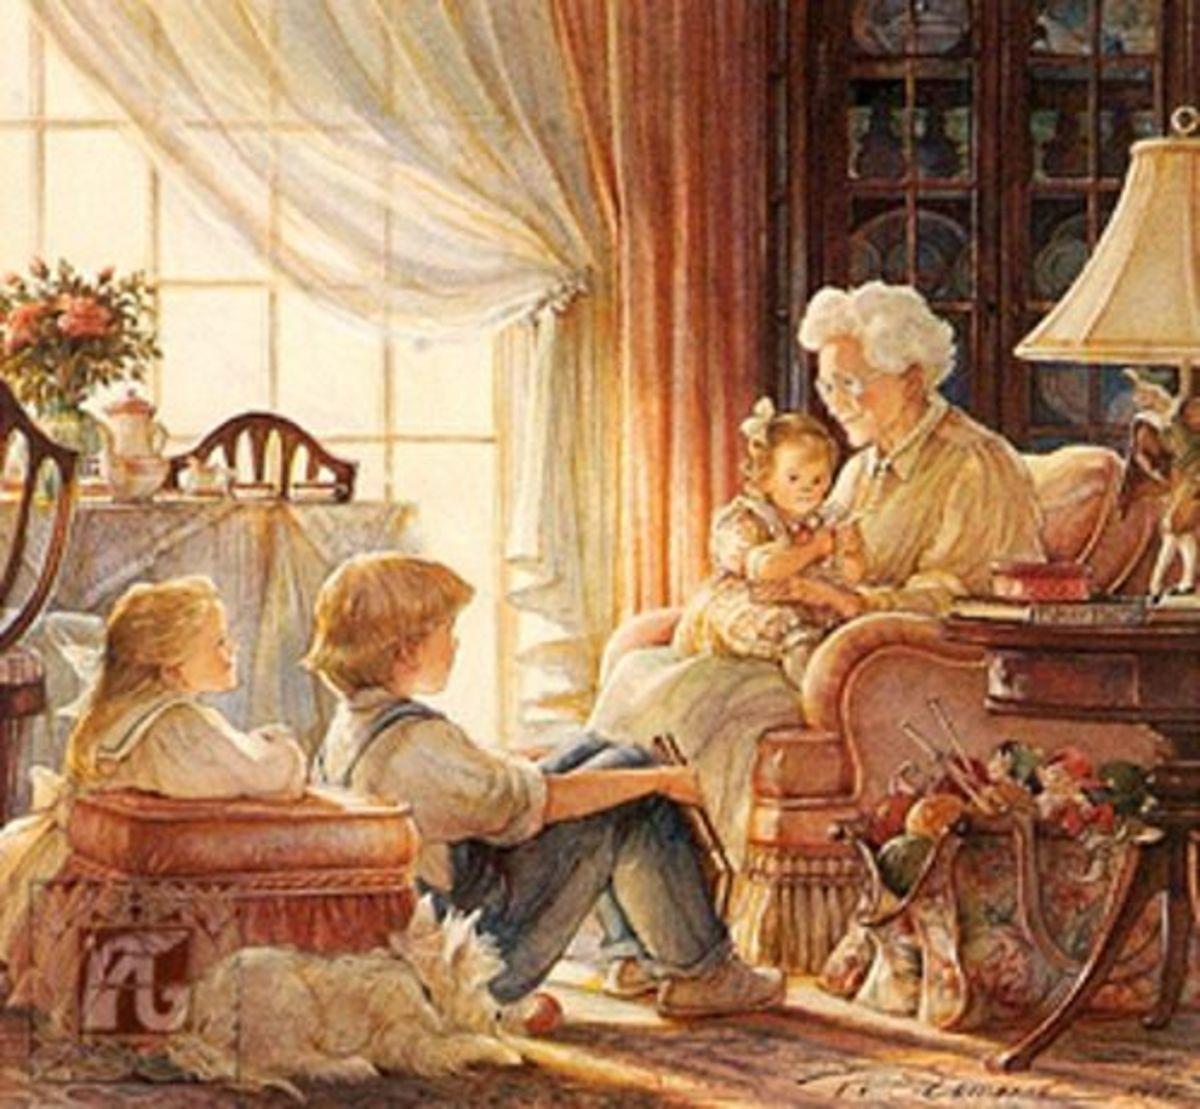 grandmas-tales-stories-of-old-ages